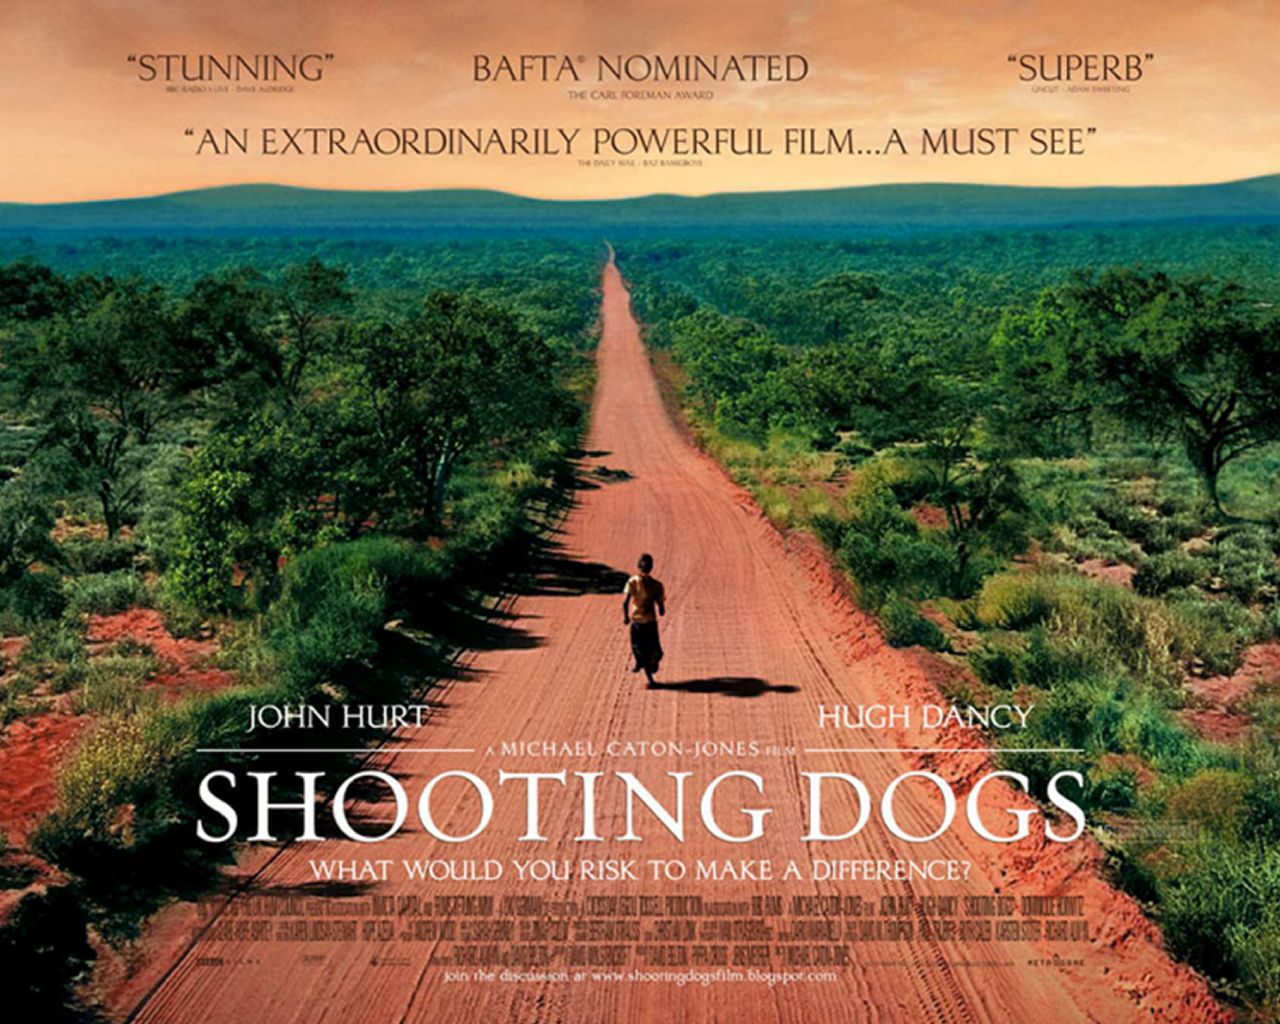 плакат фильма биллборды Отстреливая собак*